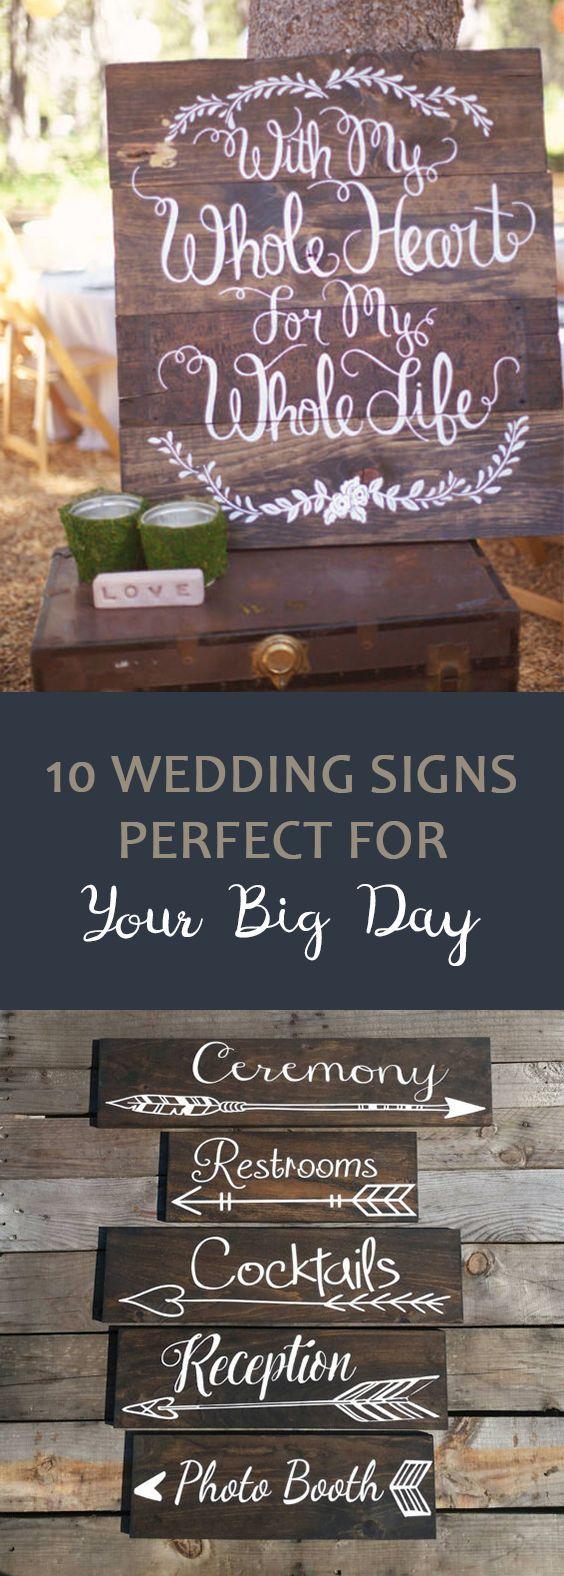 Best 25 Home Wedding Receptions Ideas On Pinterest